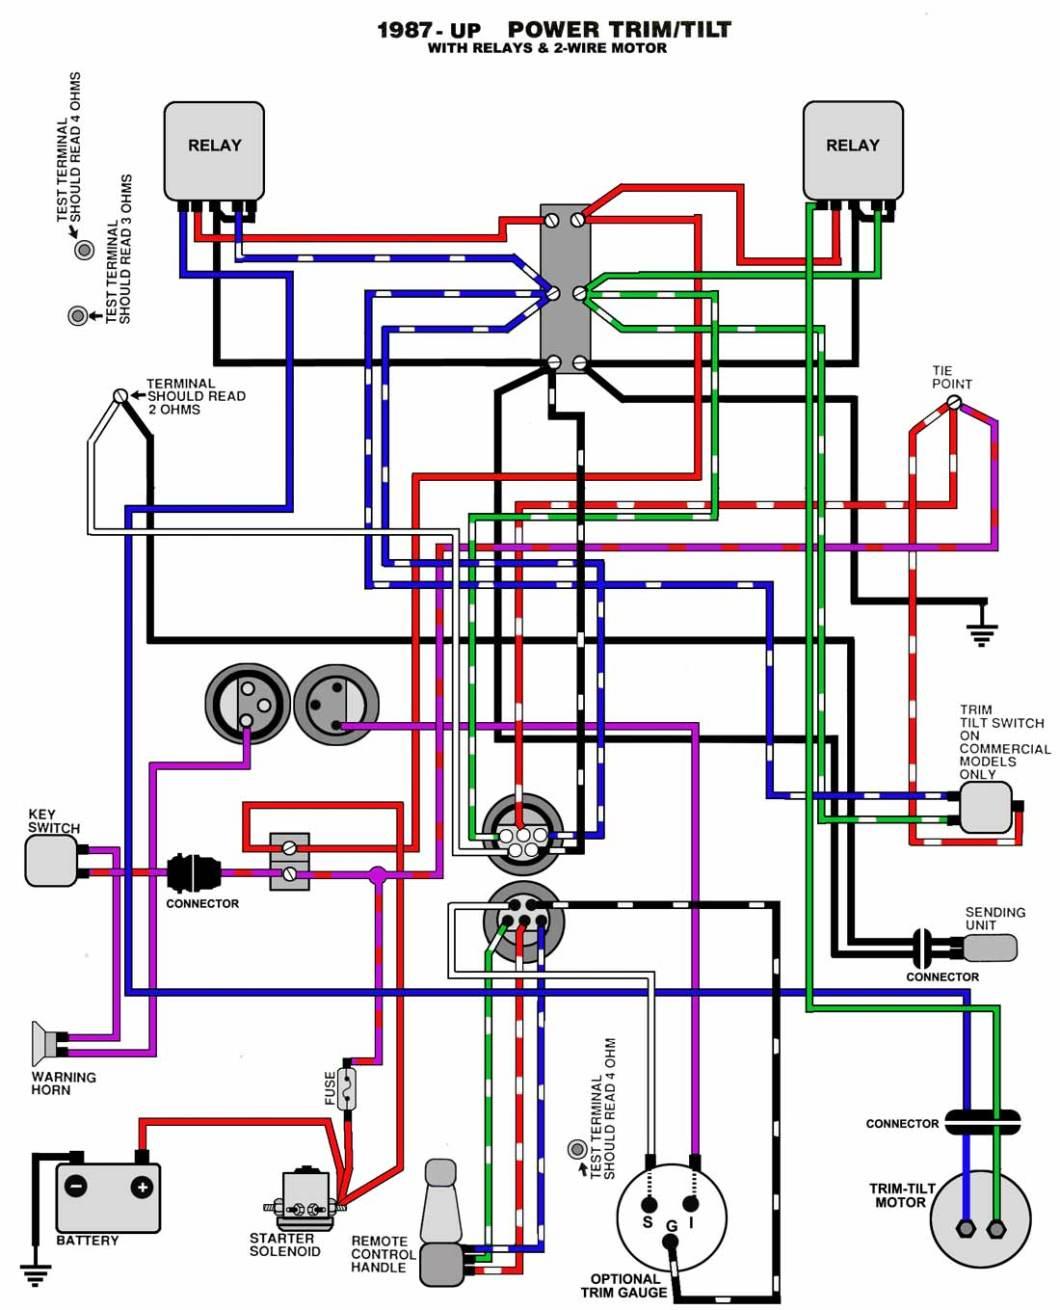 [ZHKZ_3066]  03D1 Honda Harmony 1011 Owners Manual | Wiring Library | Honda Bf90 Wiring Diagram |  | Wiring Library